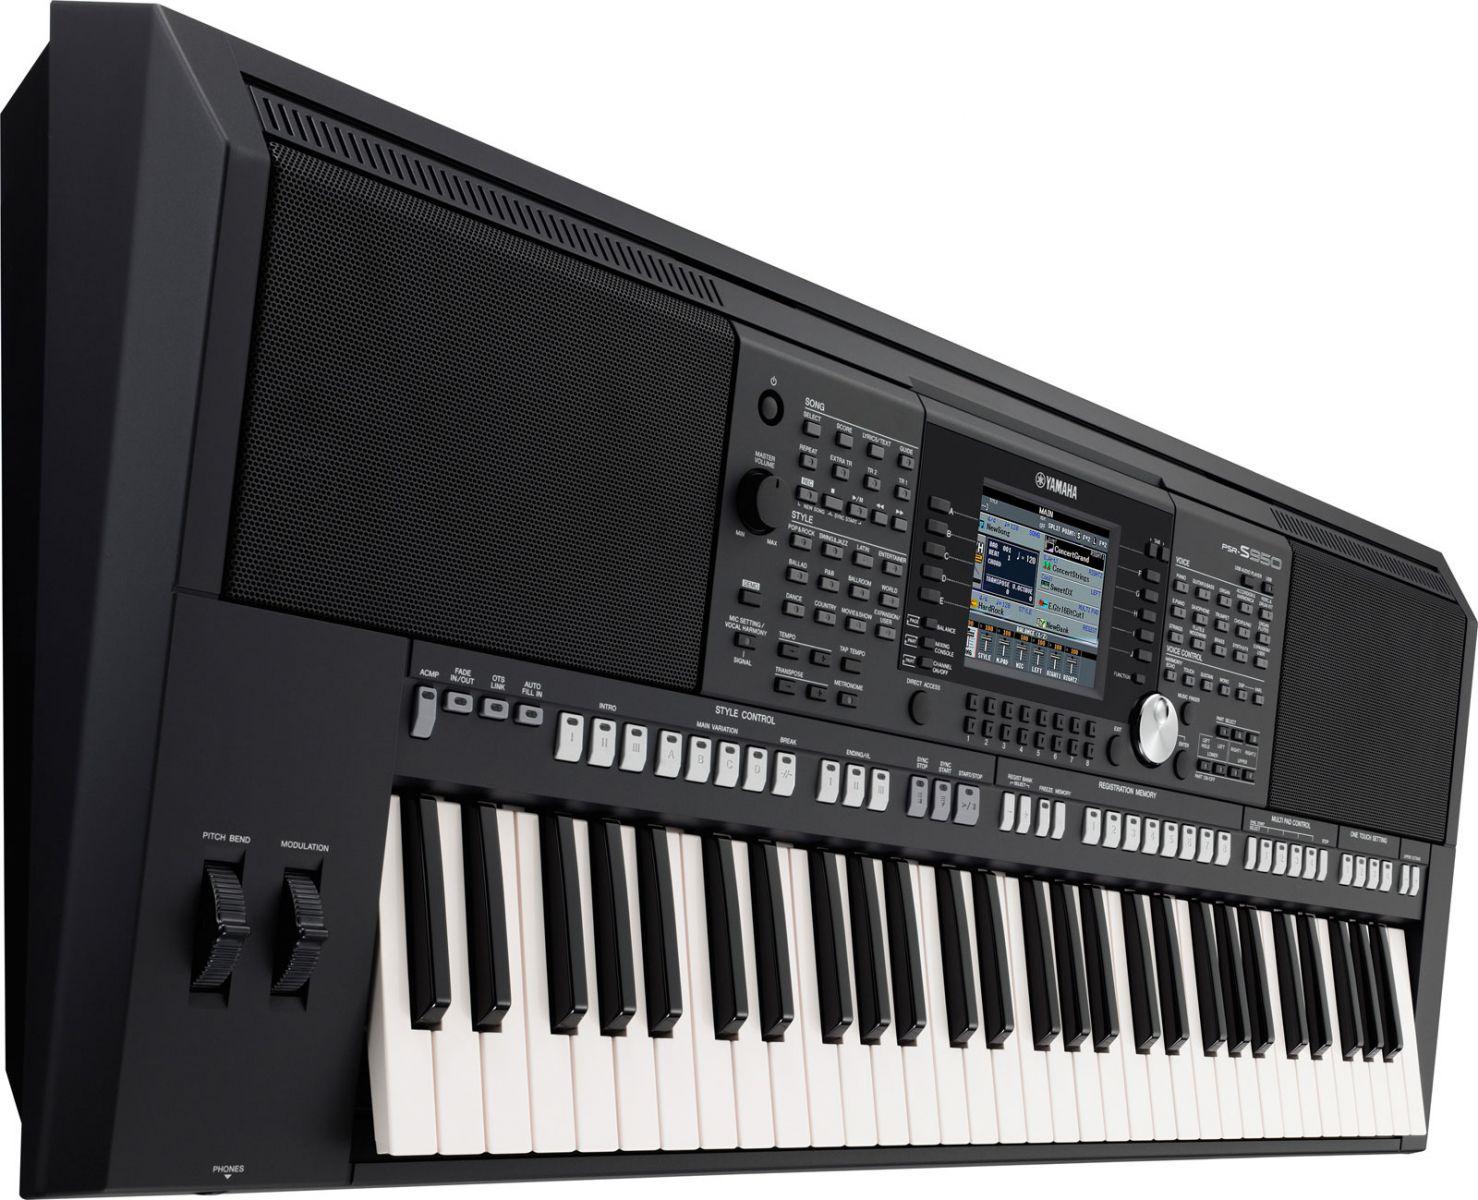 Đàn organ yamaha PSR-S950 Mới